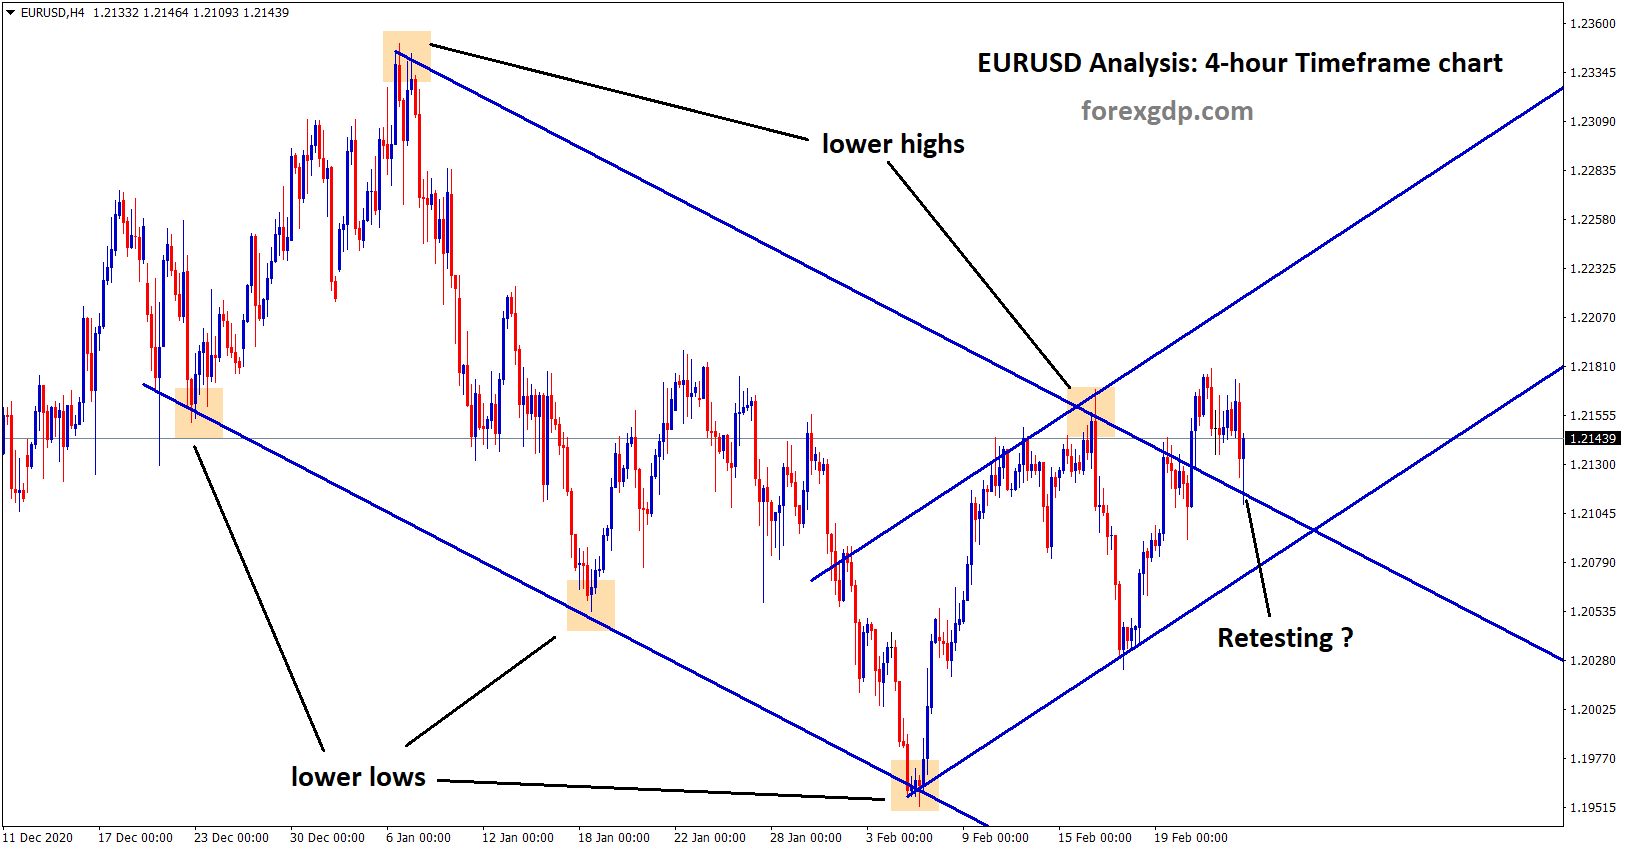 eurusd retesting the broken level in 4hr